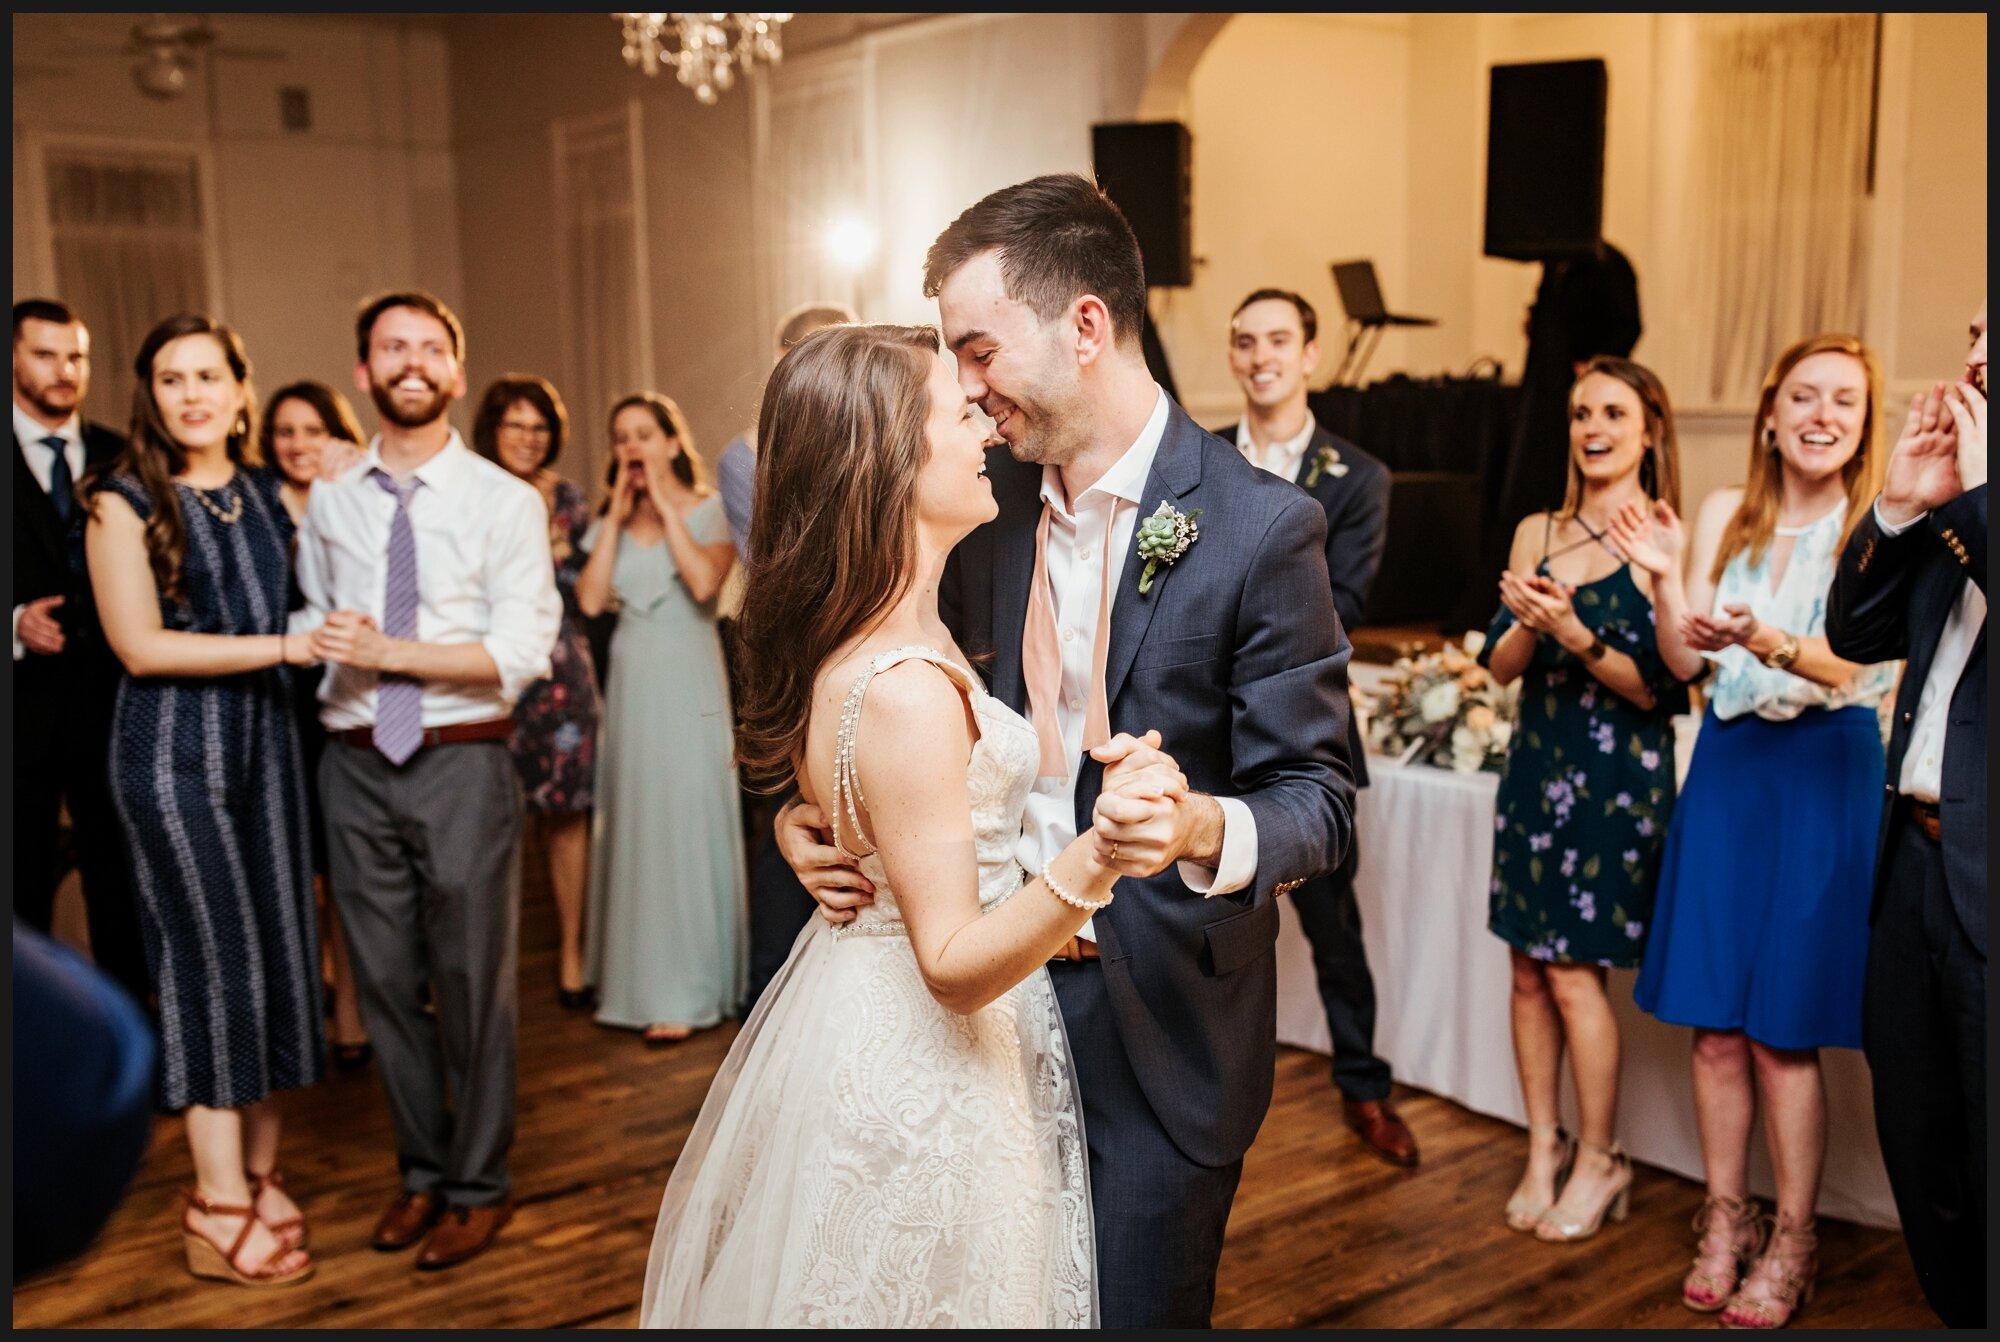 Orlando-Wedding-Photographer-destination-wedding-photographer-florida-wedding-photographer-hawaii-wedding-photographer_0695.jpg